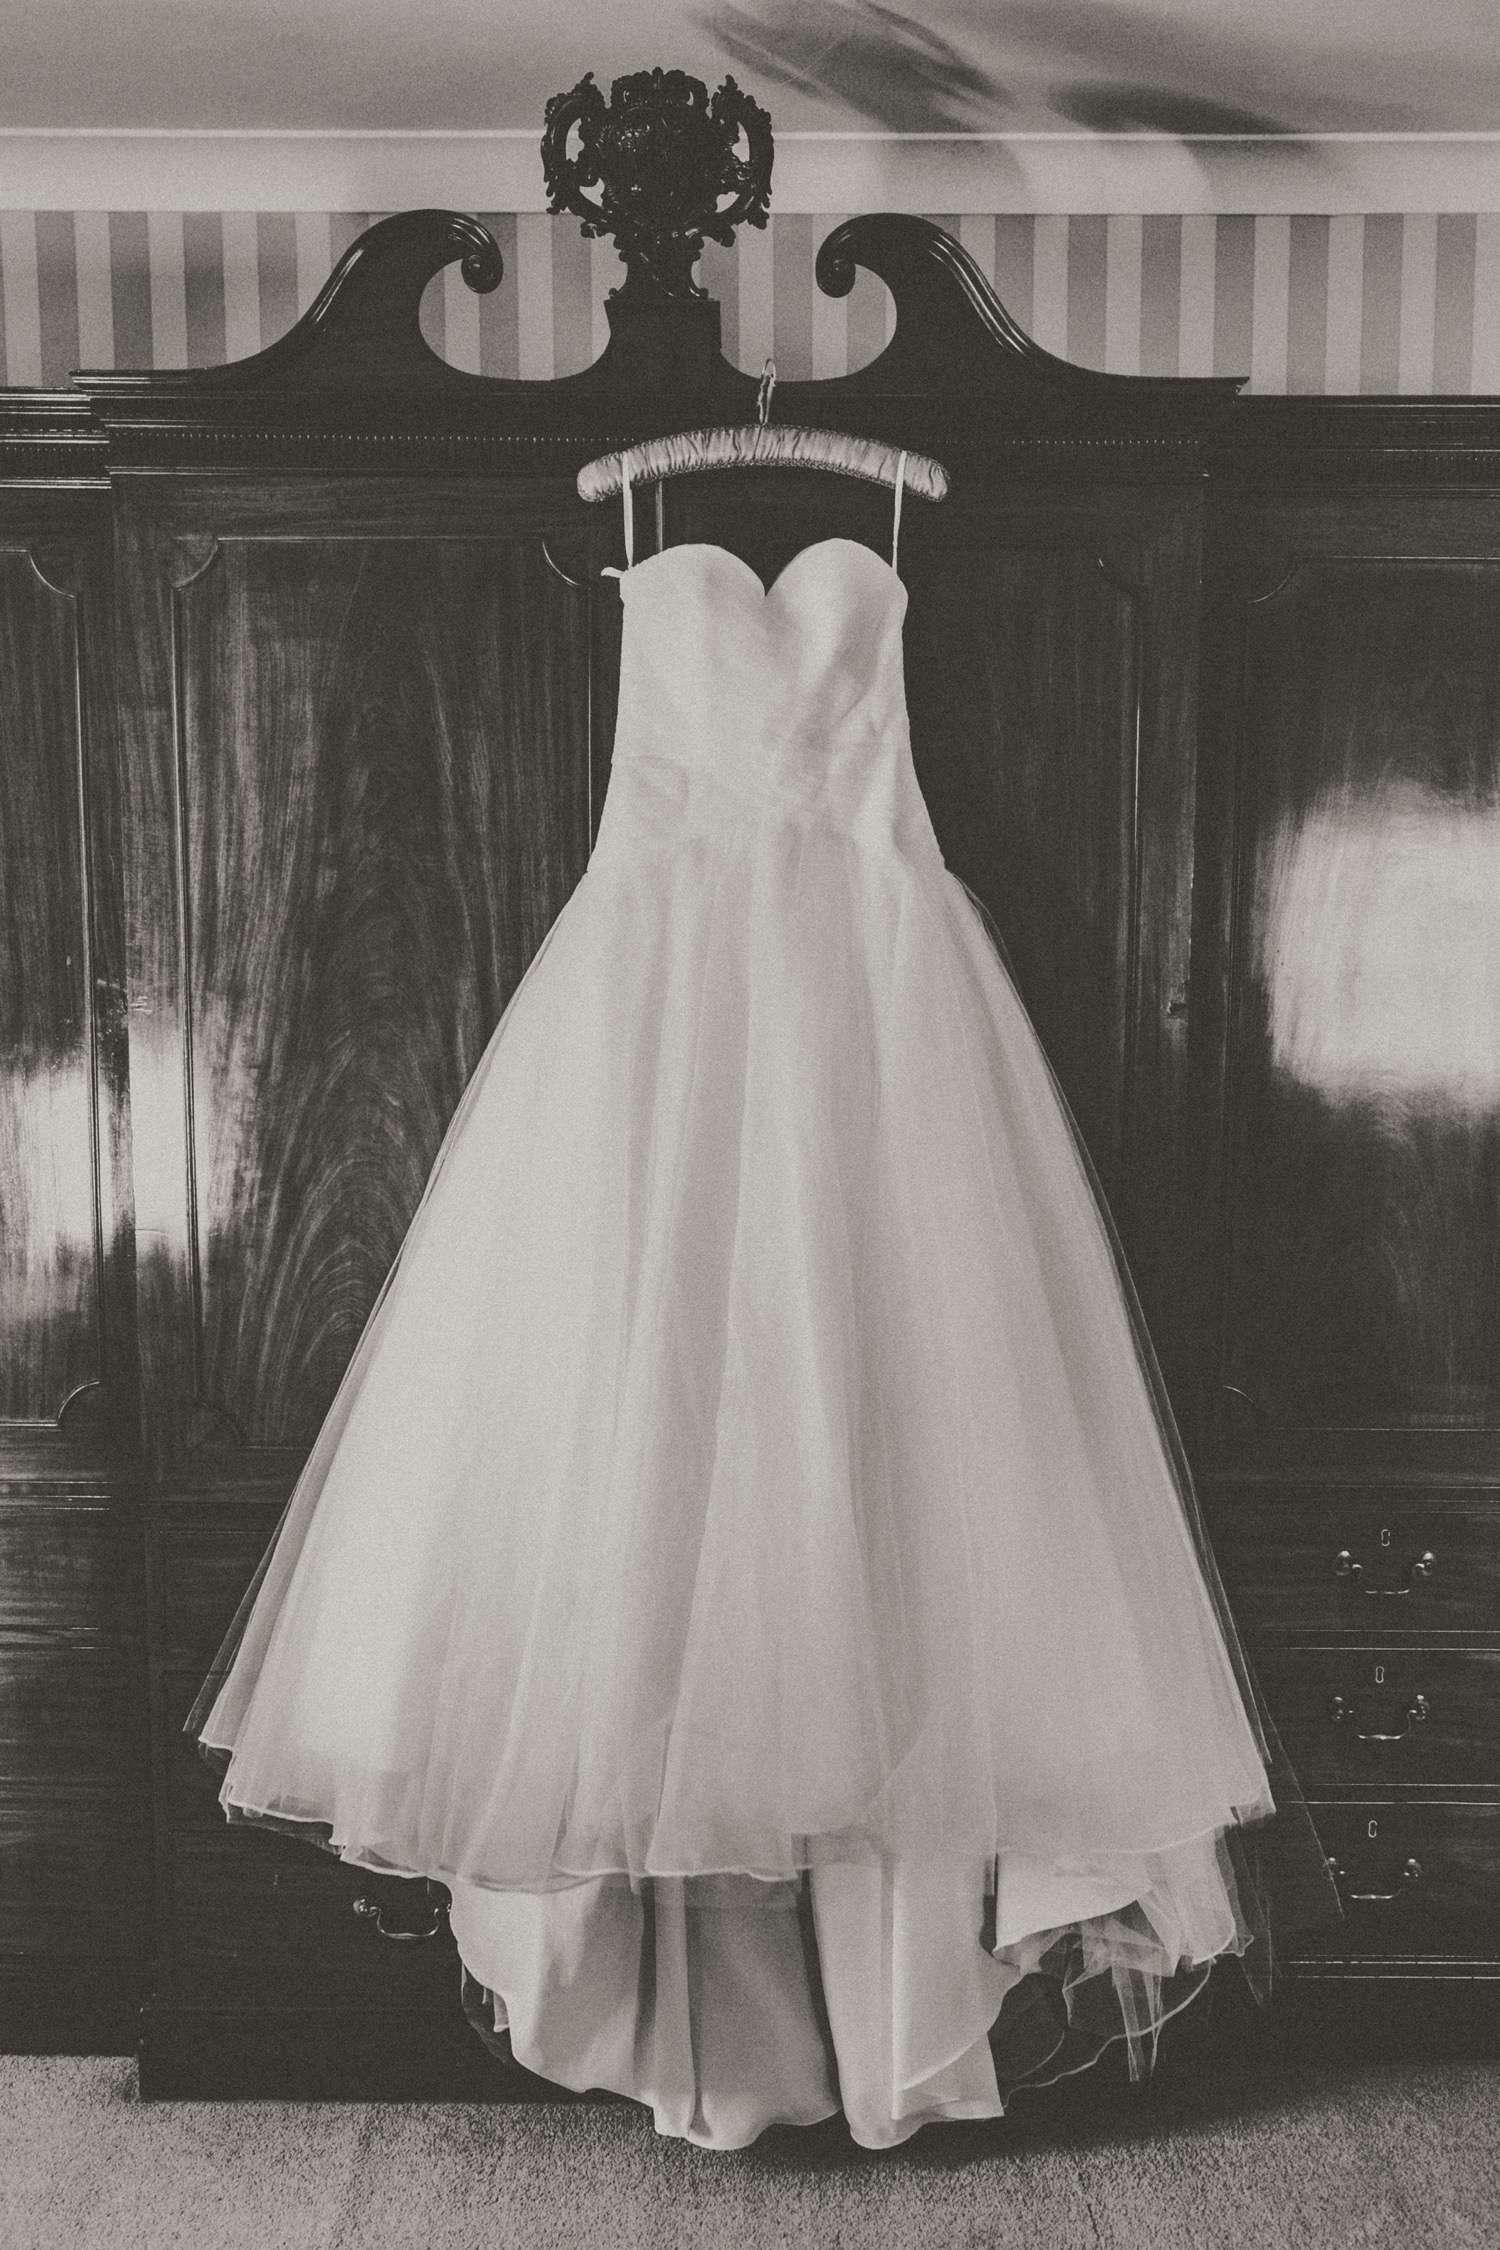 Stylish-Wedding-Photographer-Paul-Liddement-Wedding-Stories-3.jpg